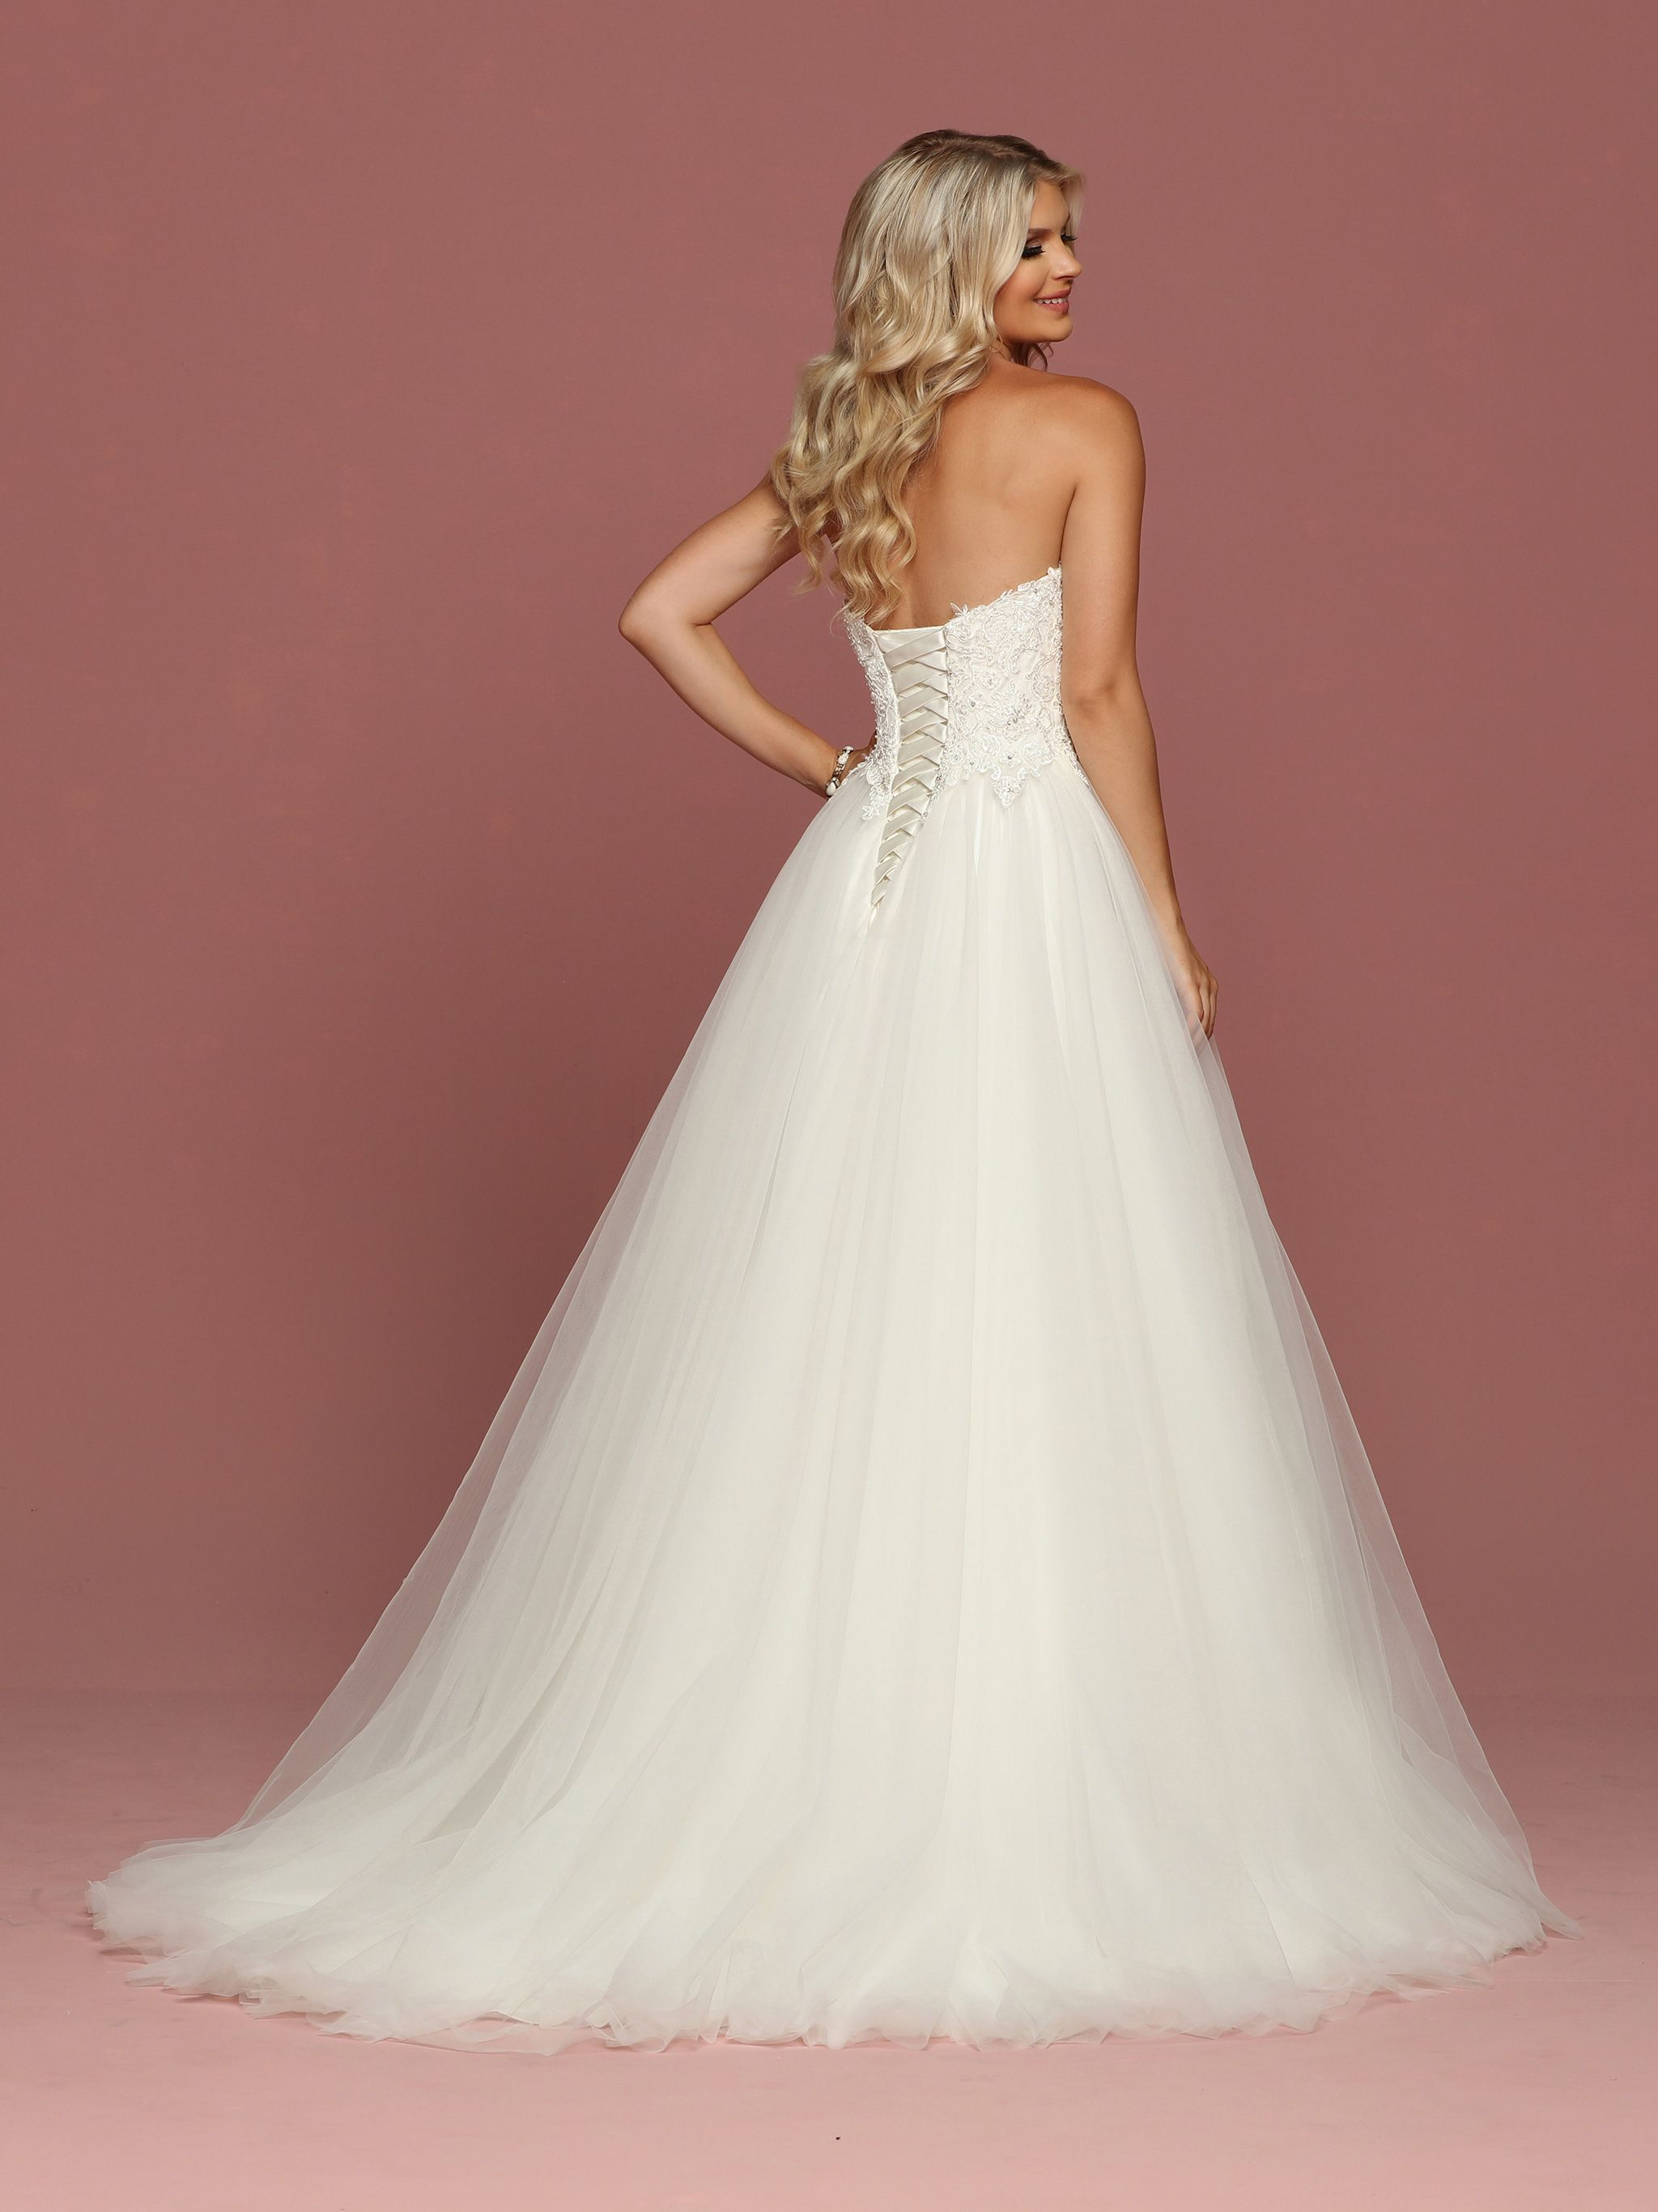 Back view of style davinci bridal pinterest wedding